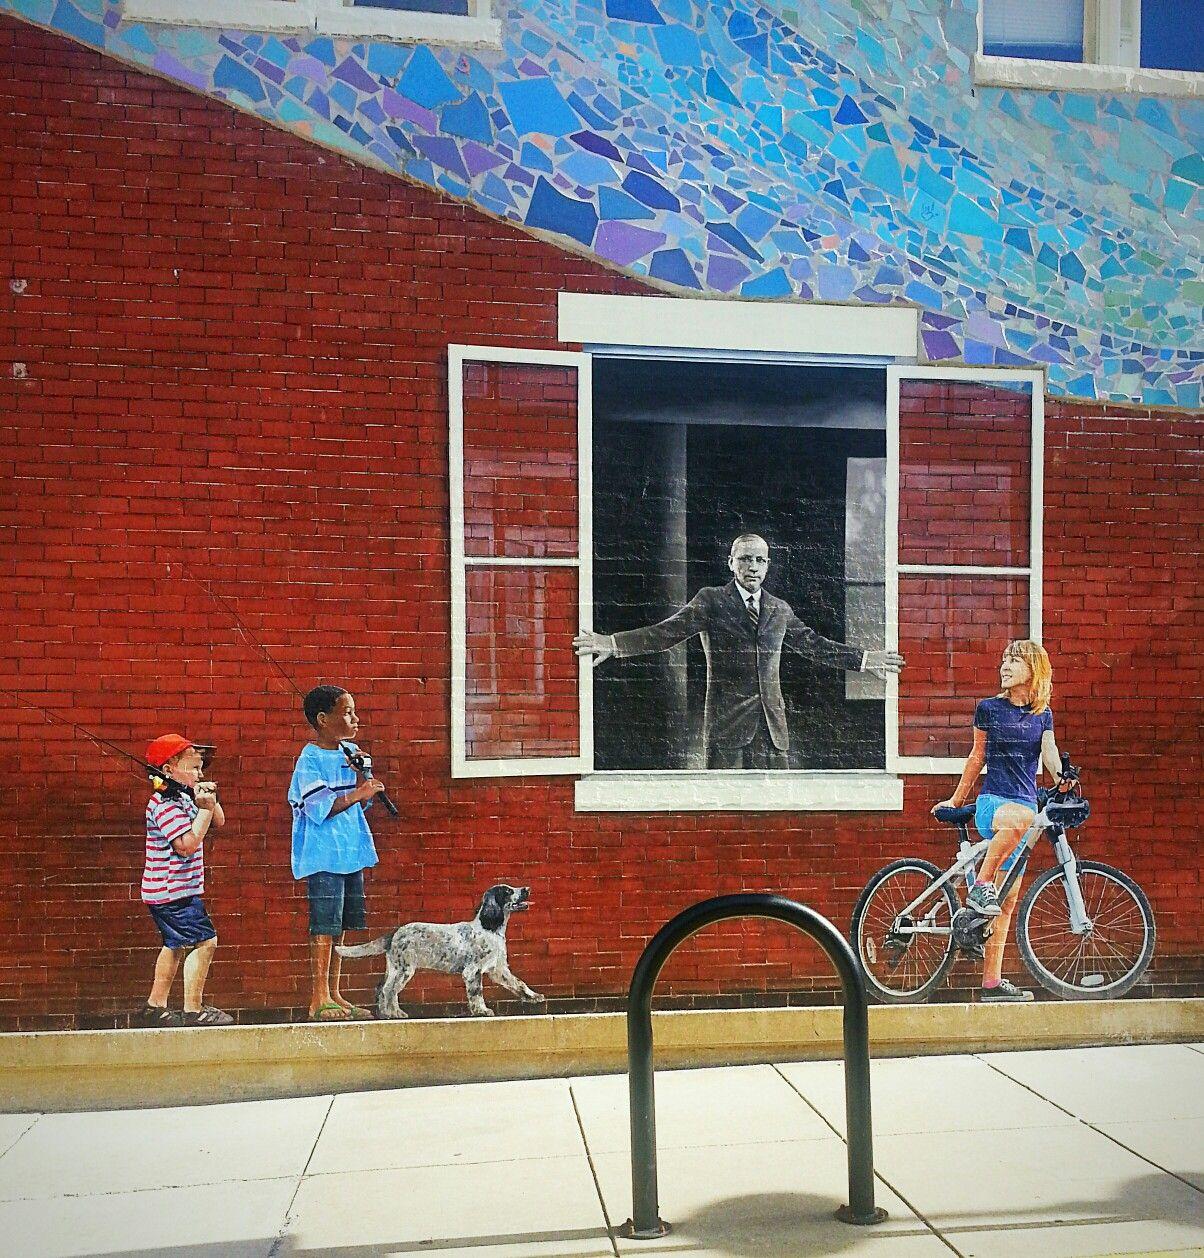 Street Art located in Brunswick, Maryland